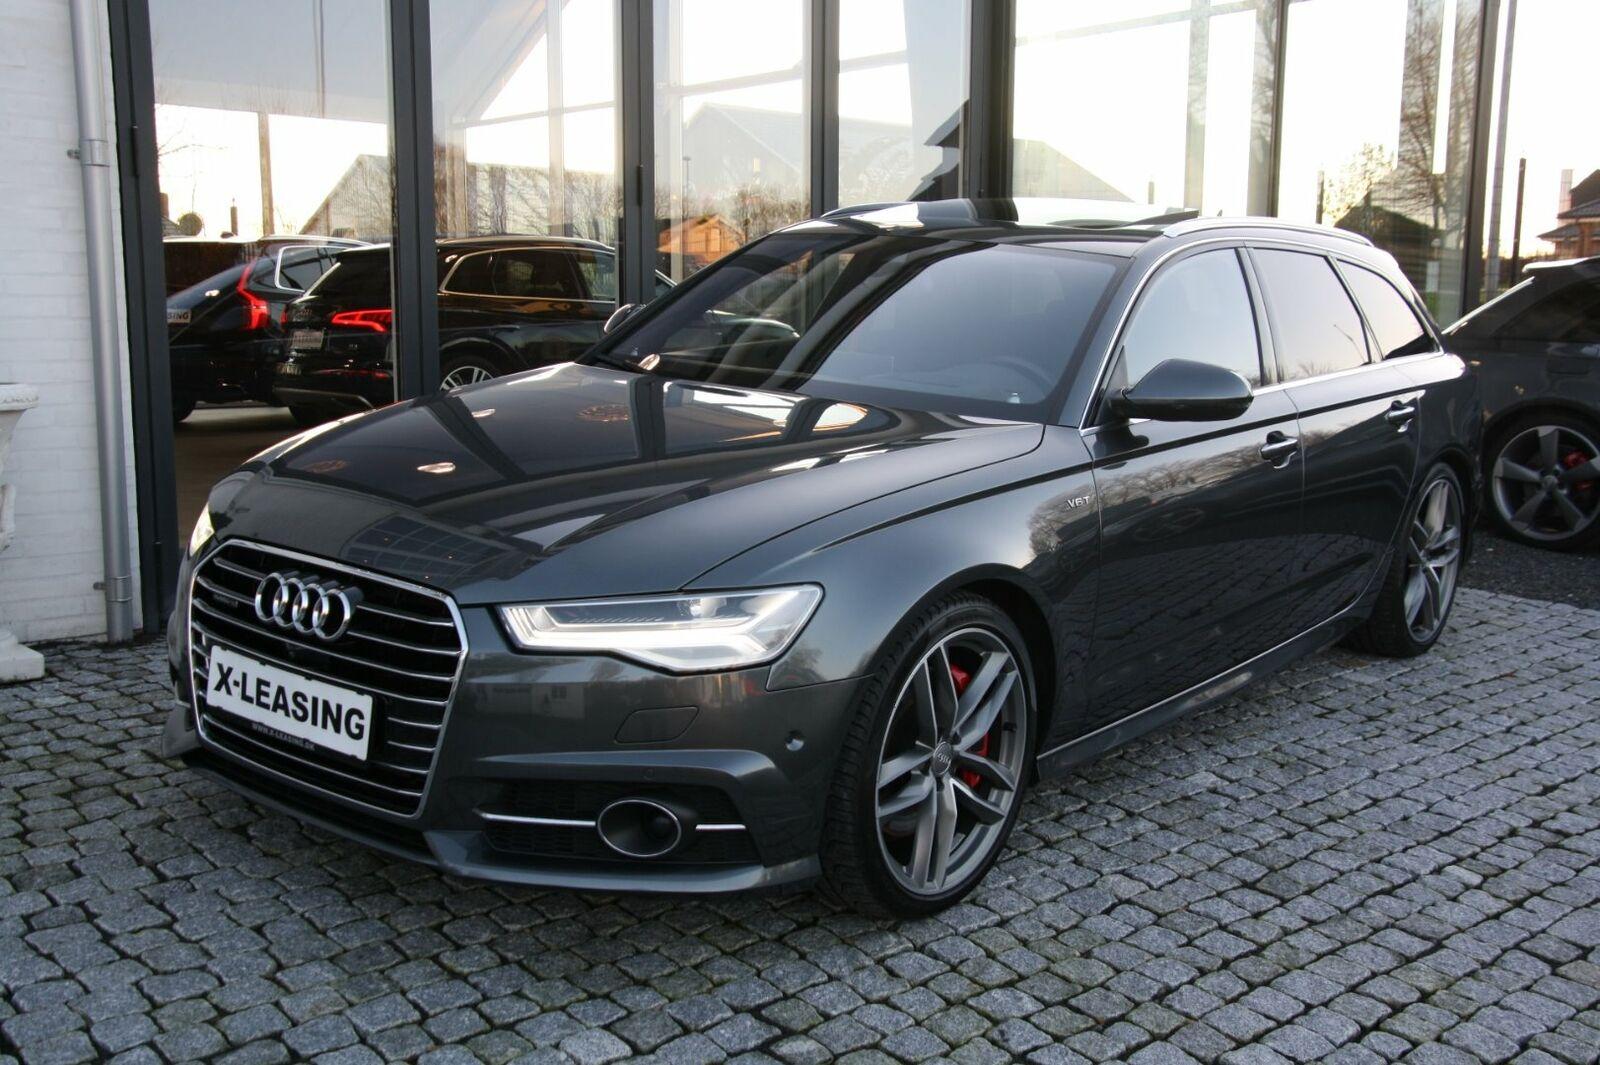 Audi A6 3,0 TDi 326 Avant quattro Tiptr. 5d - 4.970 kr.